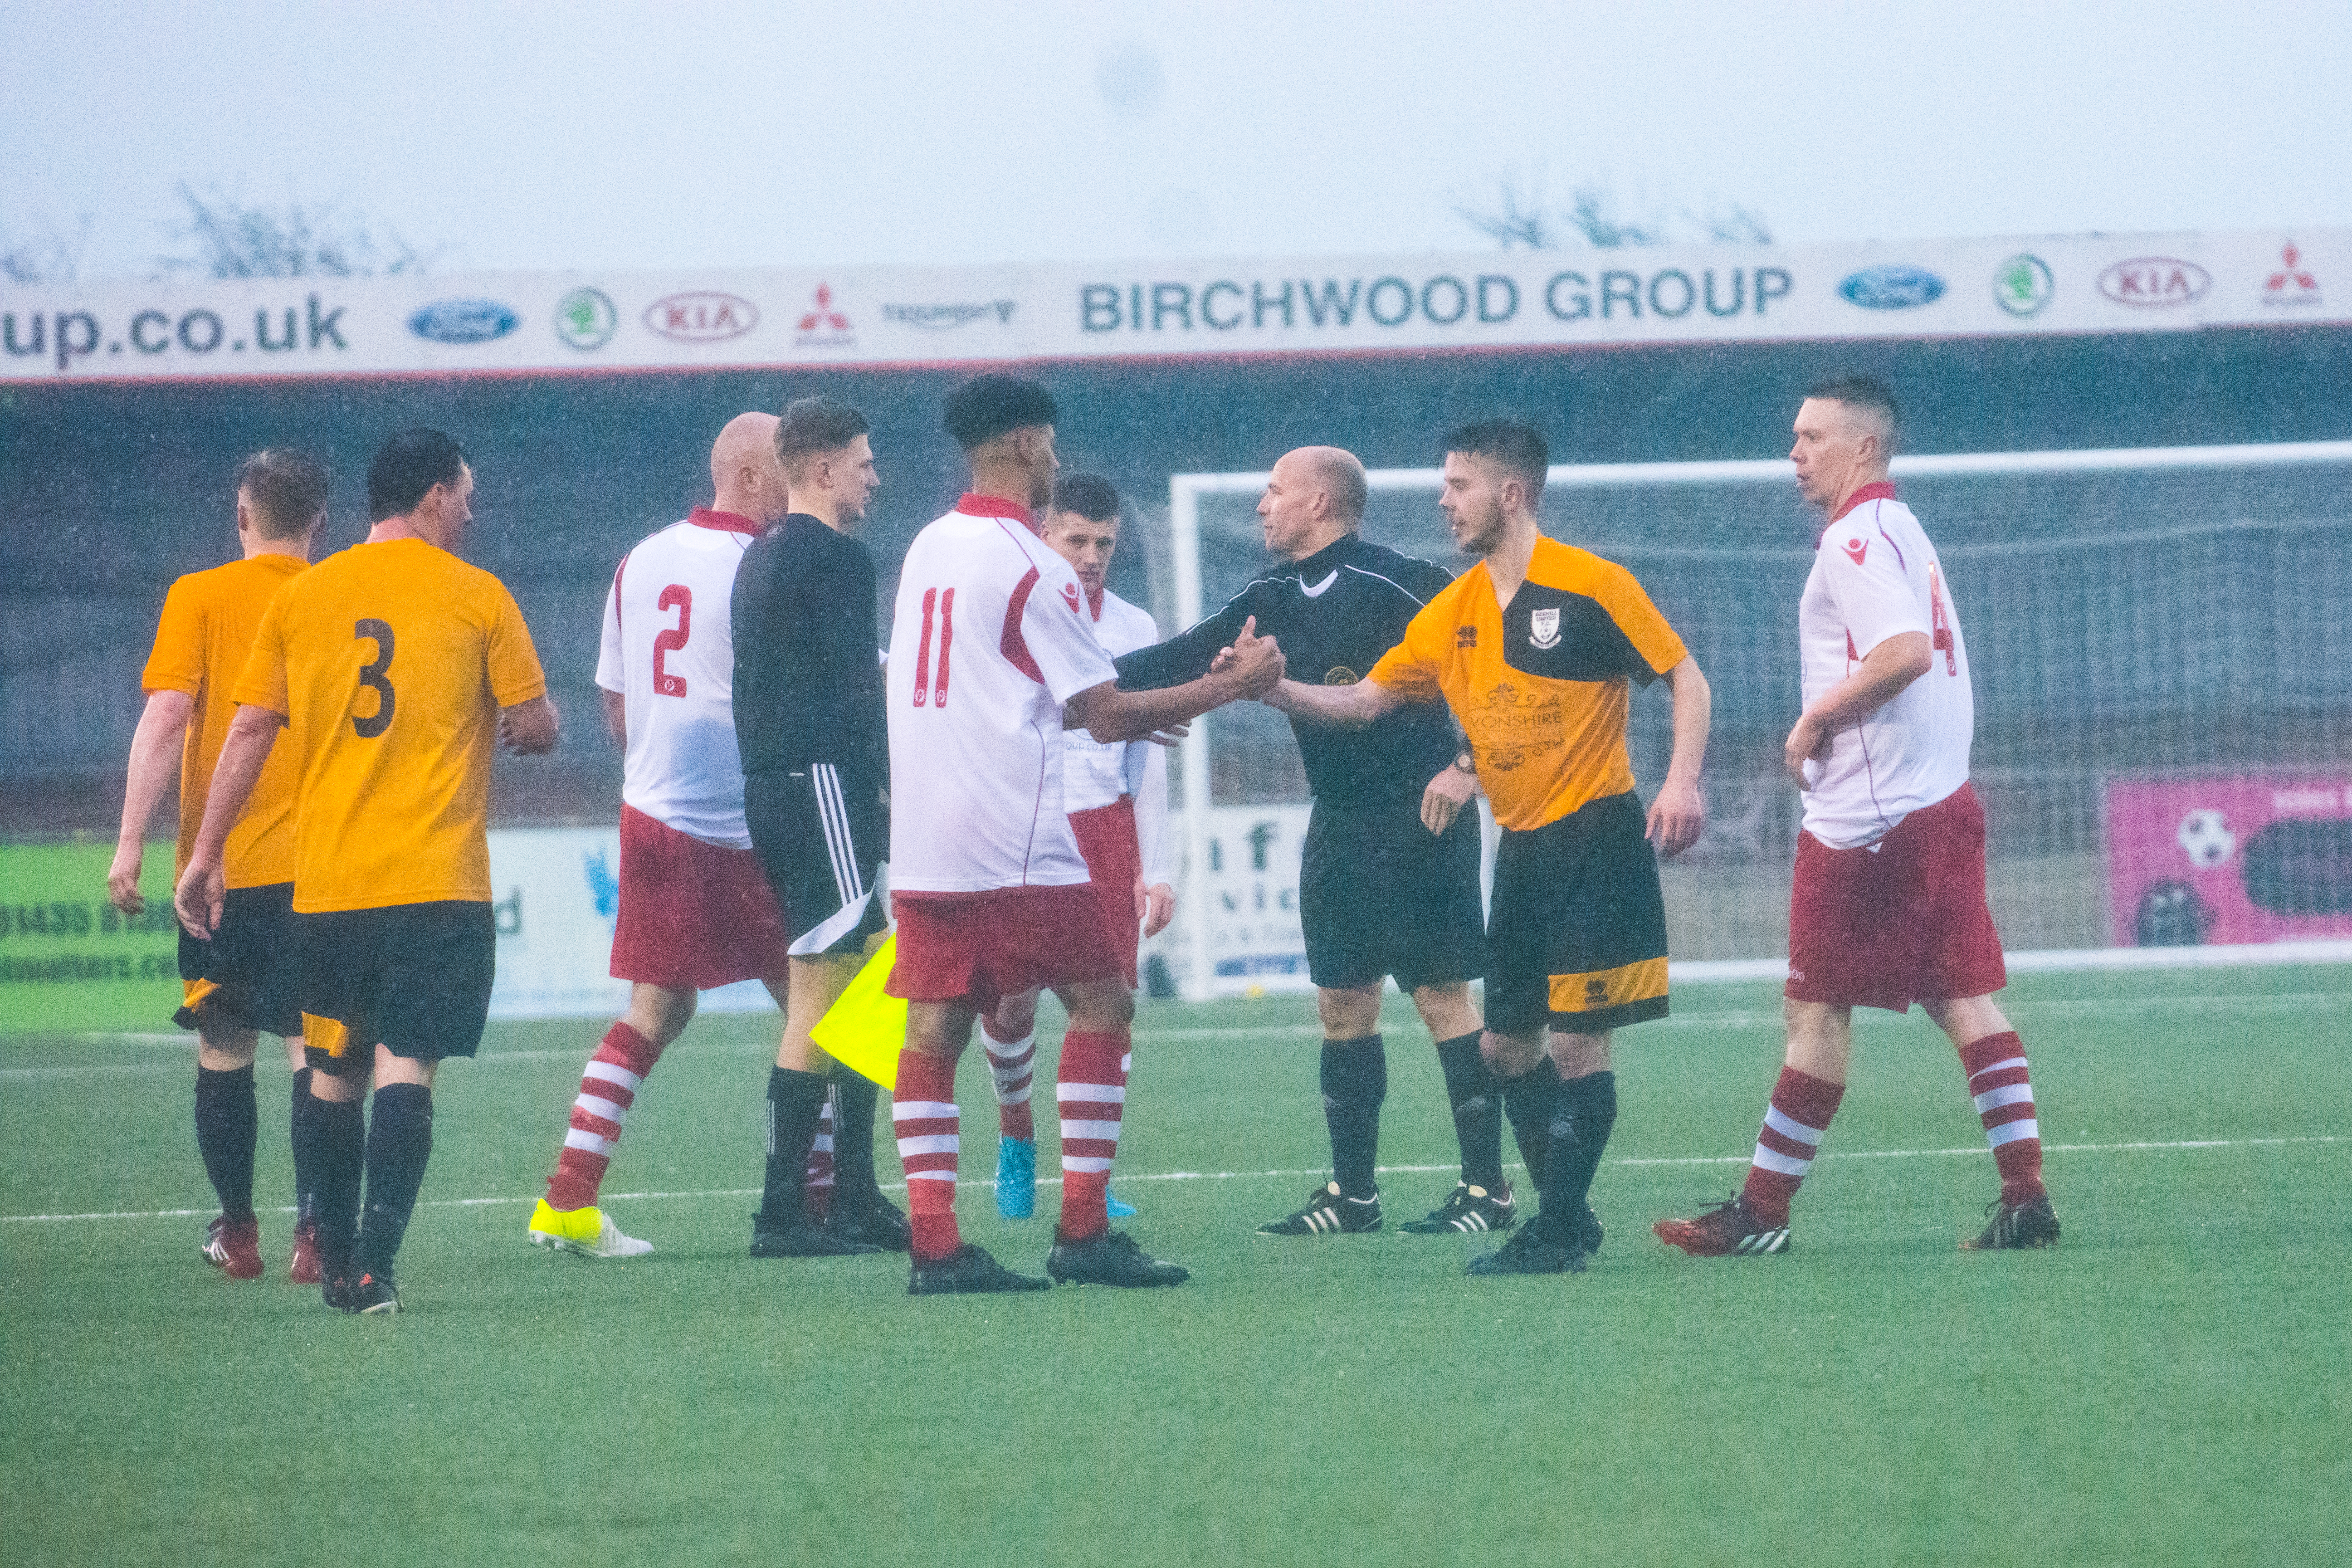 DAVID_JEFFERY Langney Wanderers FC vs Bexhill United FC 03.03.18 103